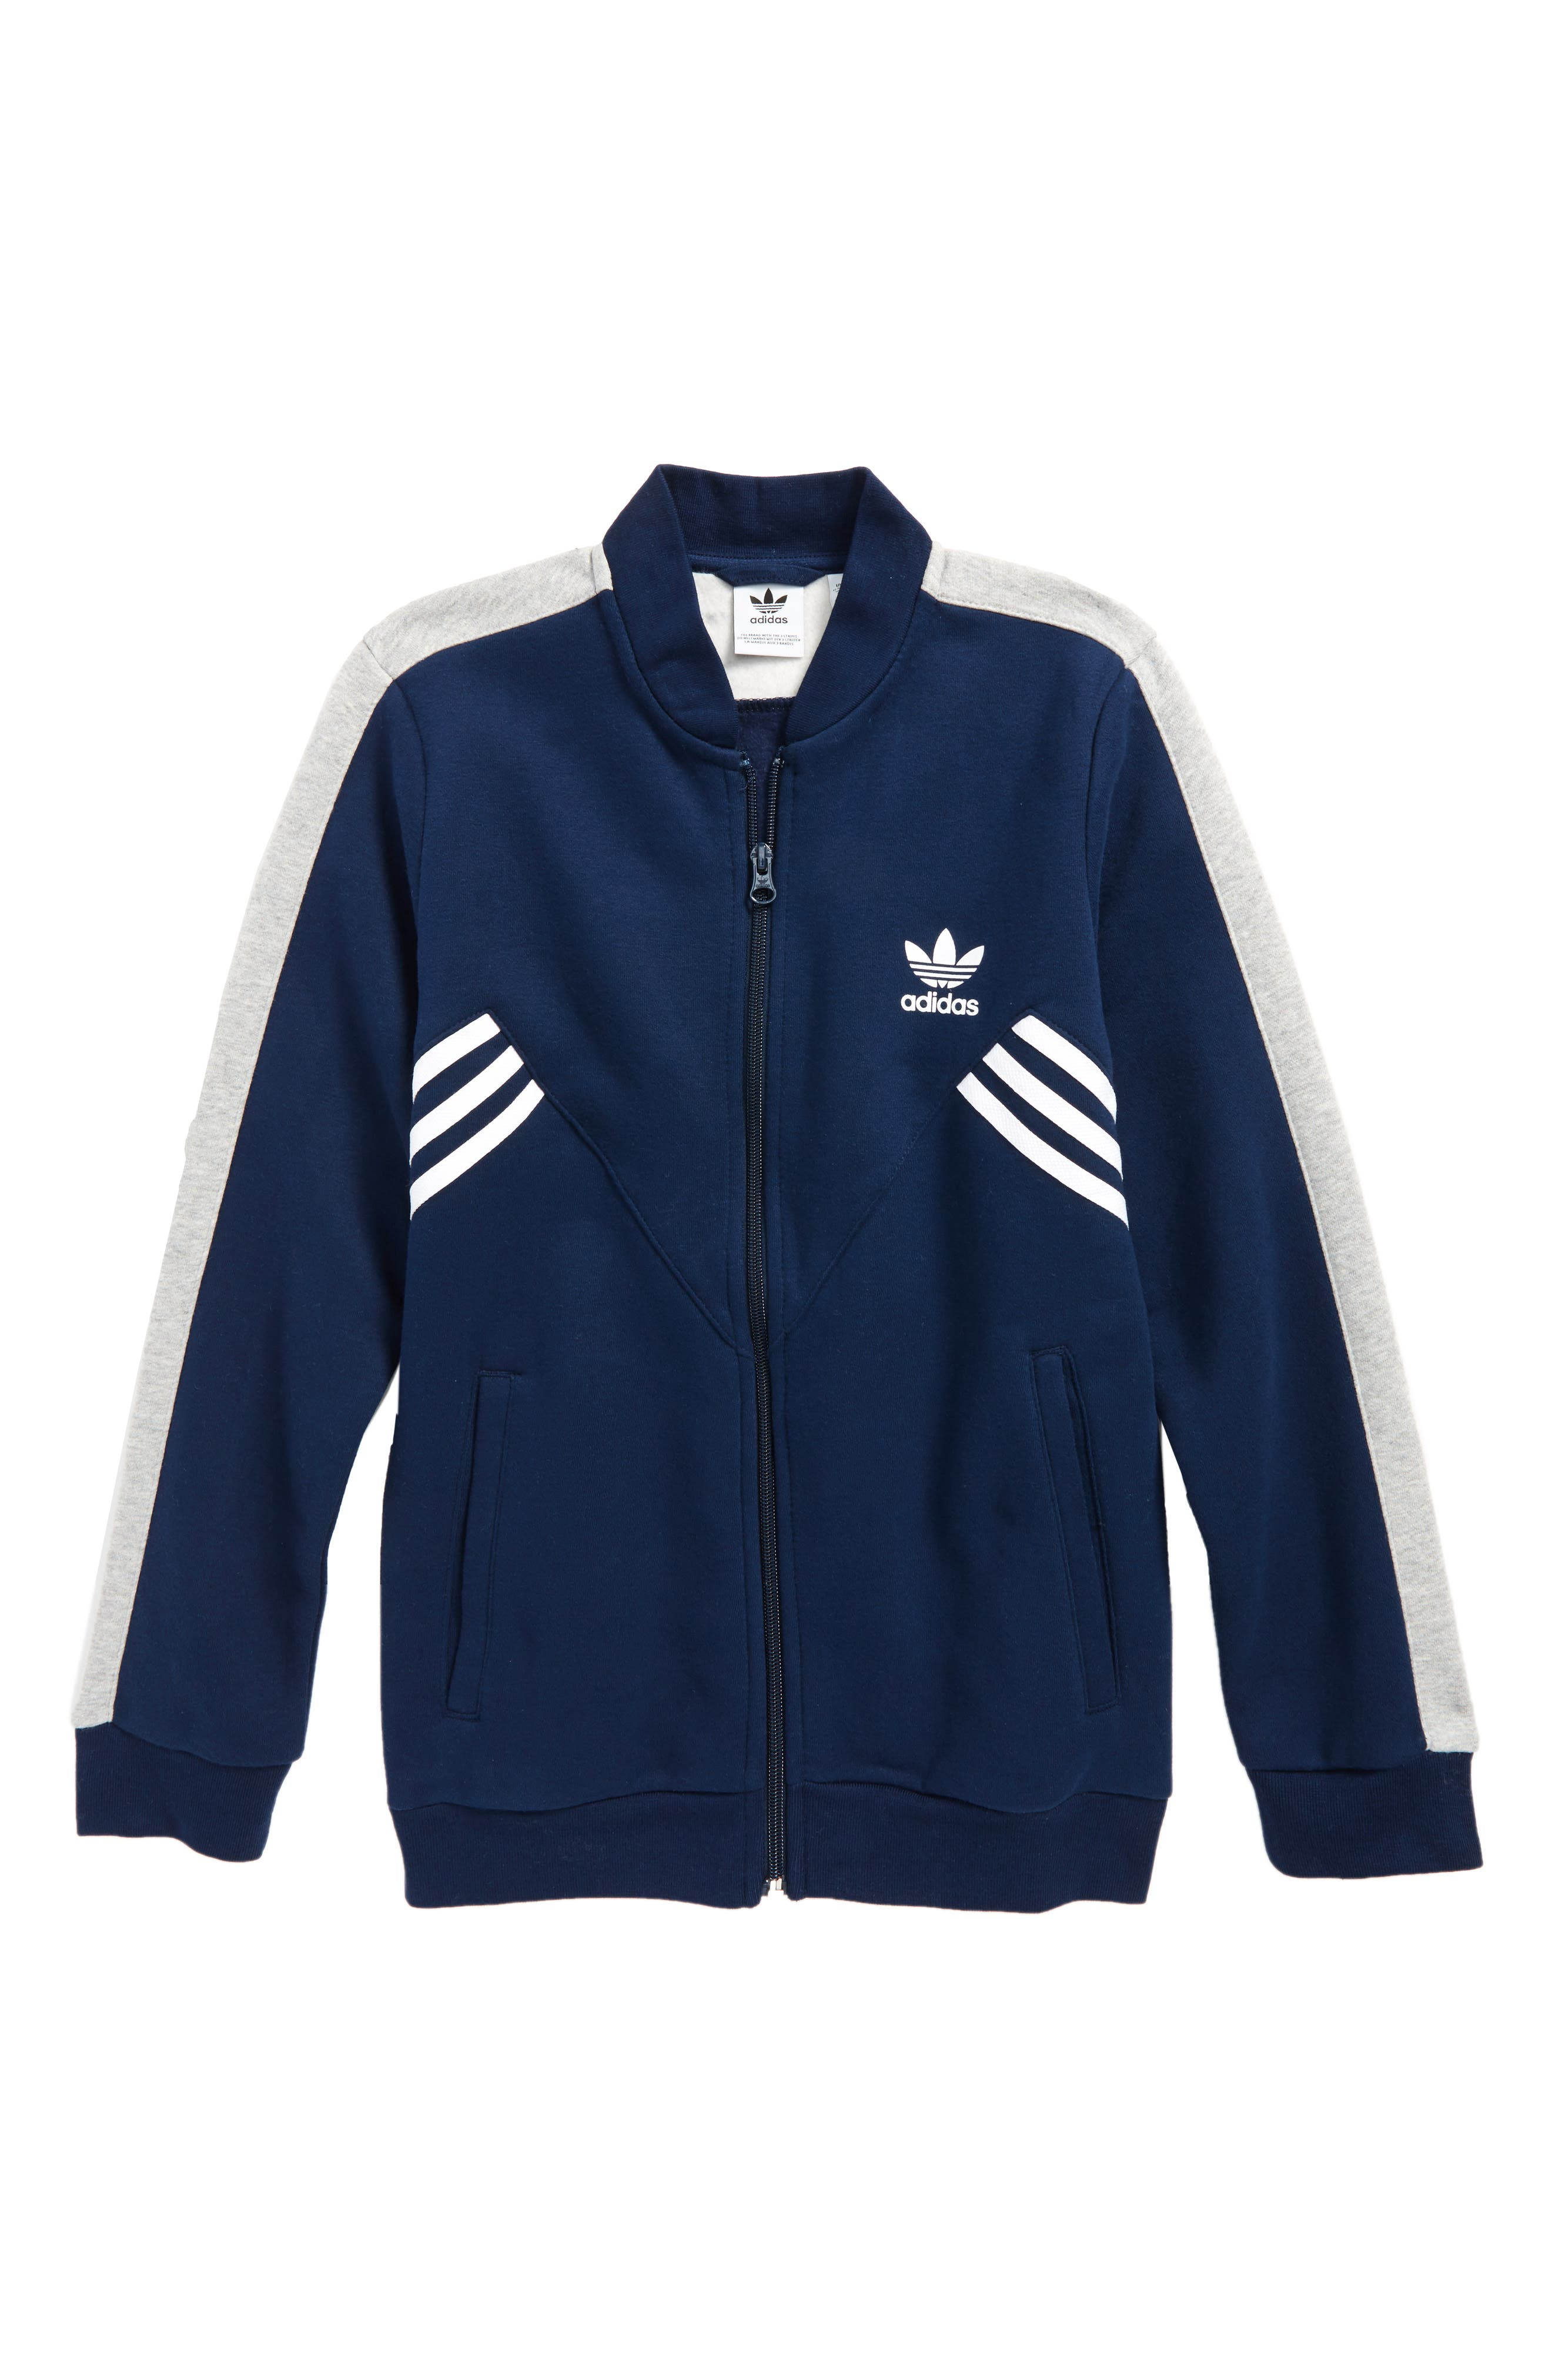 adidas SST Track Jacket,                             Main thumbnail 1, color,                             Collegiate Navy/ Medium Grey